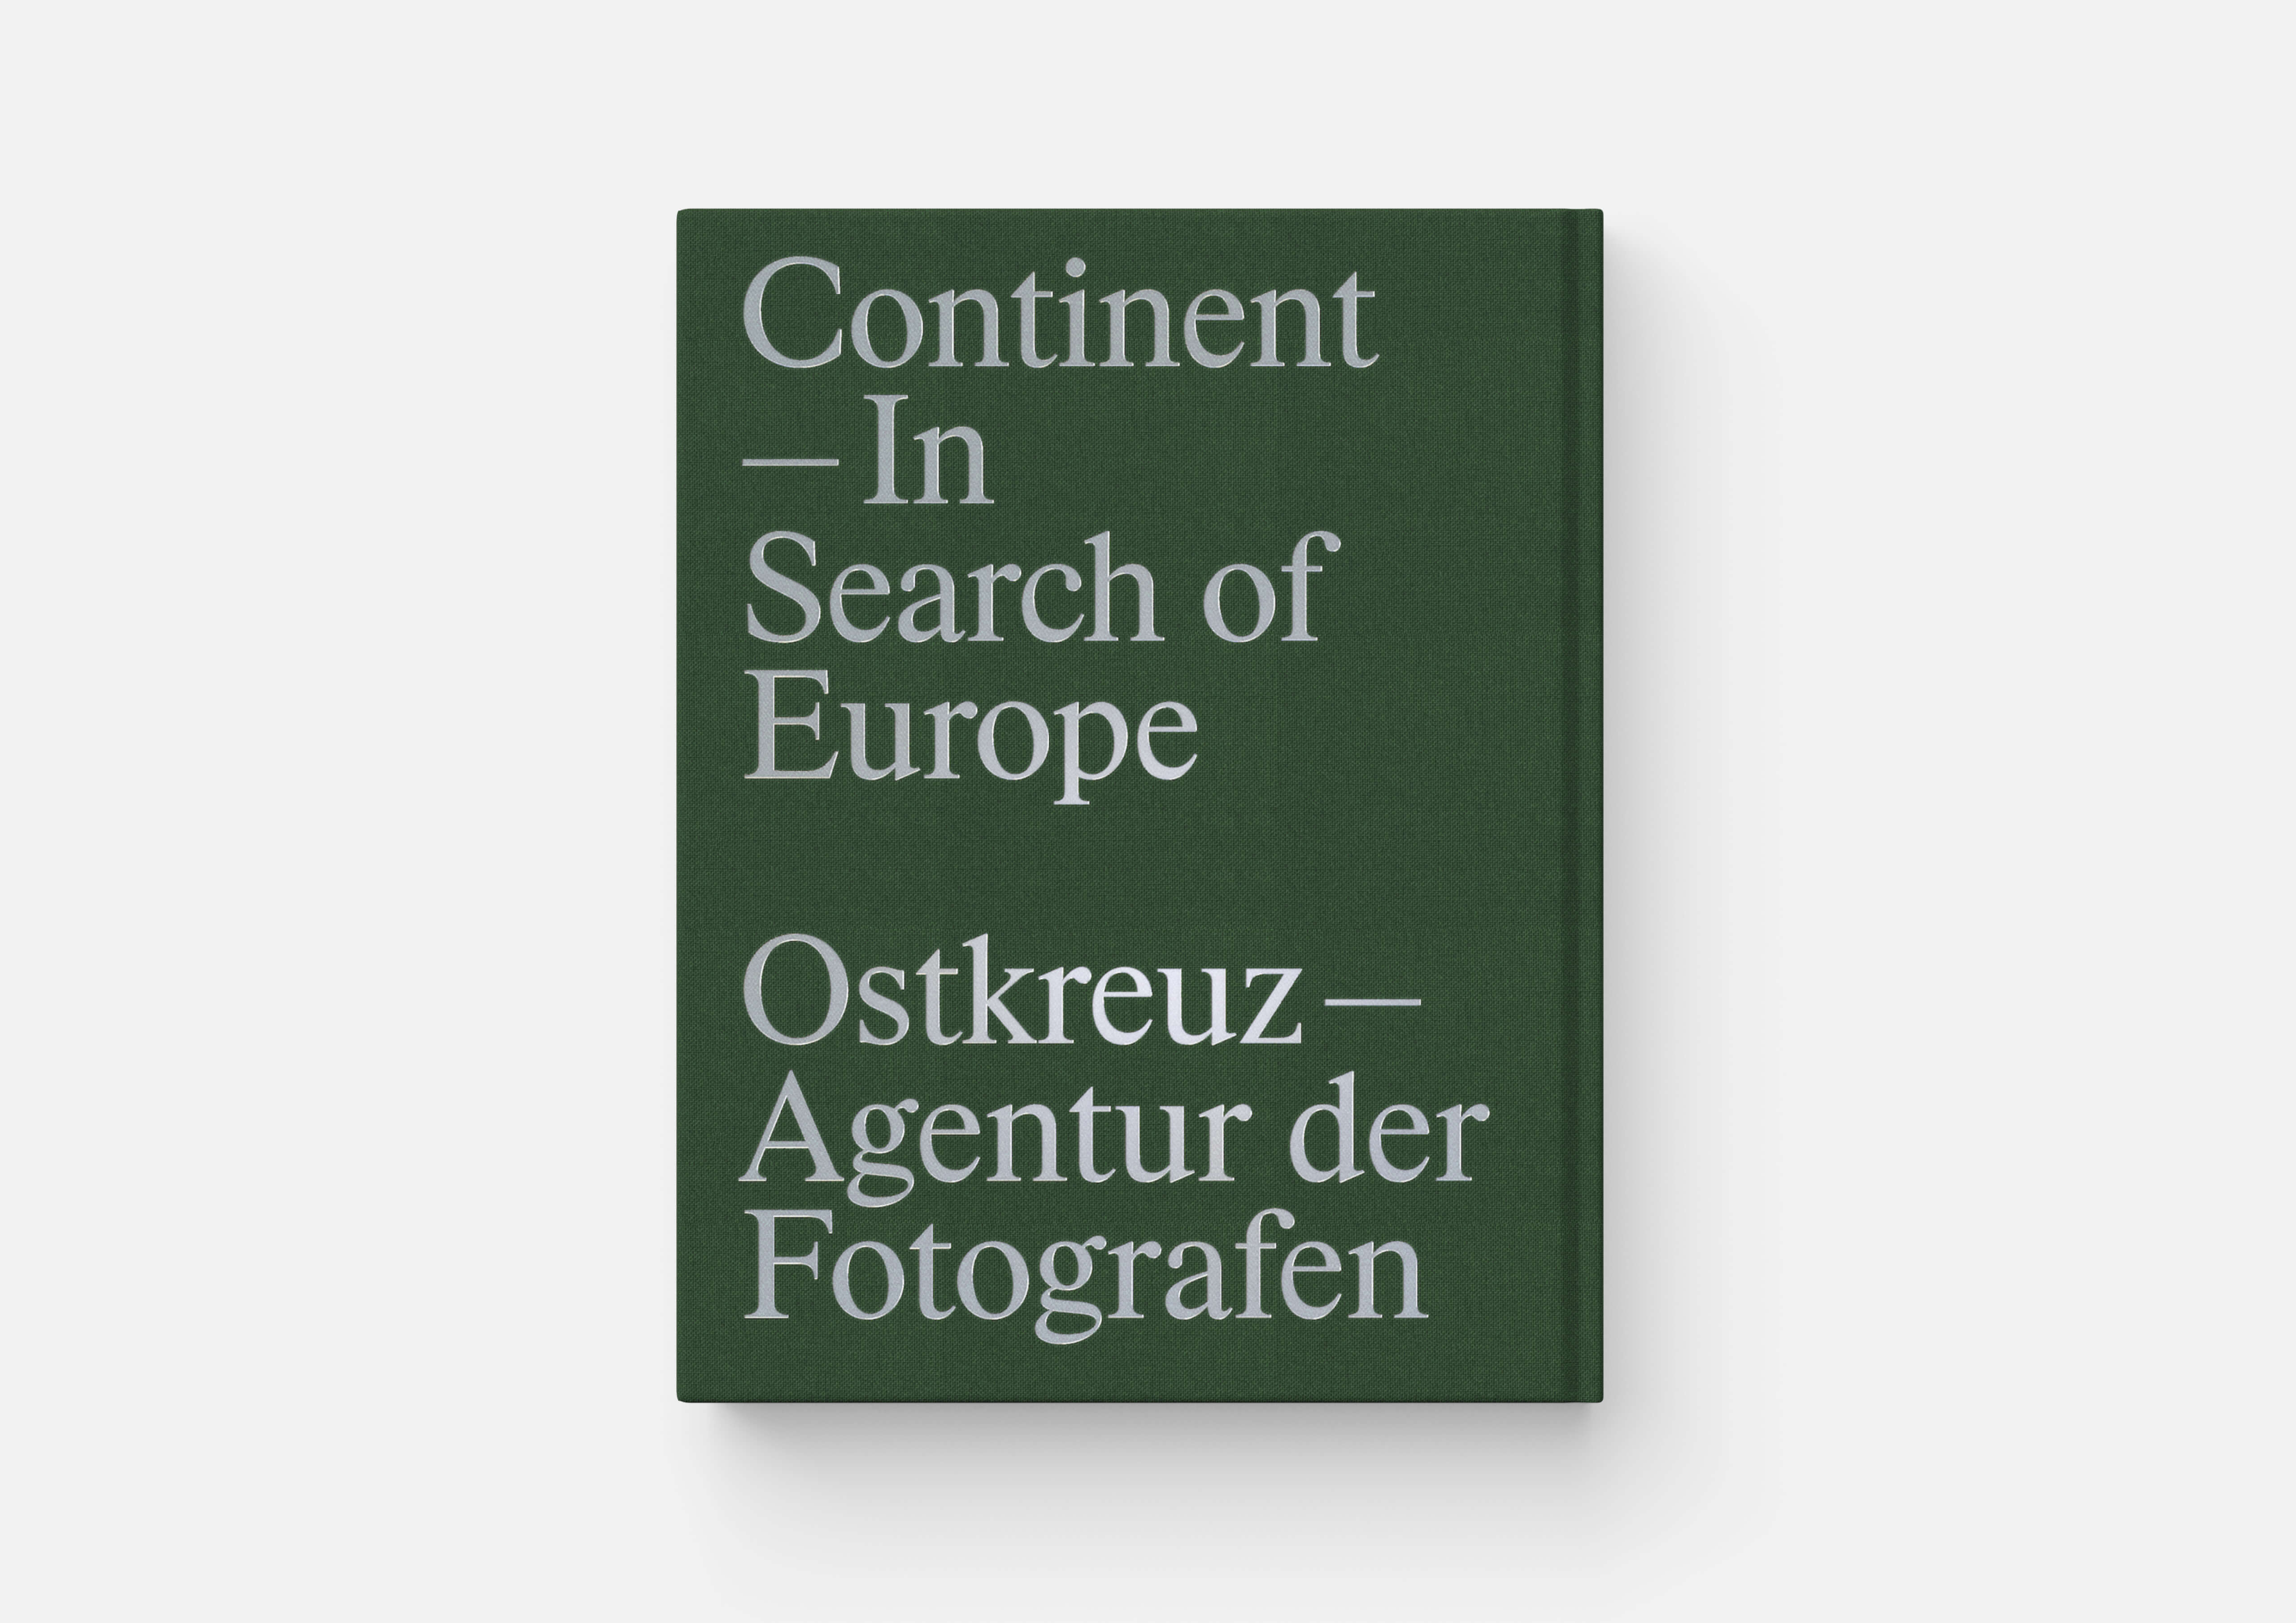 https://neuegestaltung.de/media/pages/clients/ostkreuz-kontinent/84c50b43ea-1606670610/1_ostkreuz-kont-cover-back.jpg